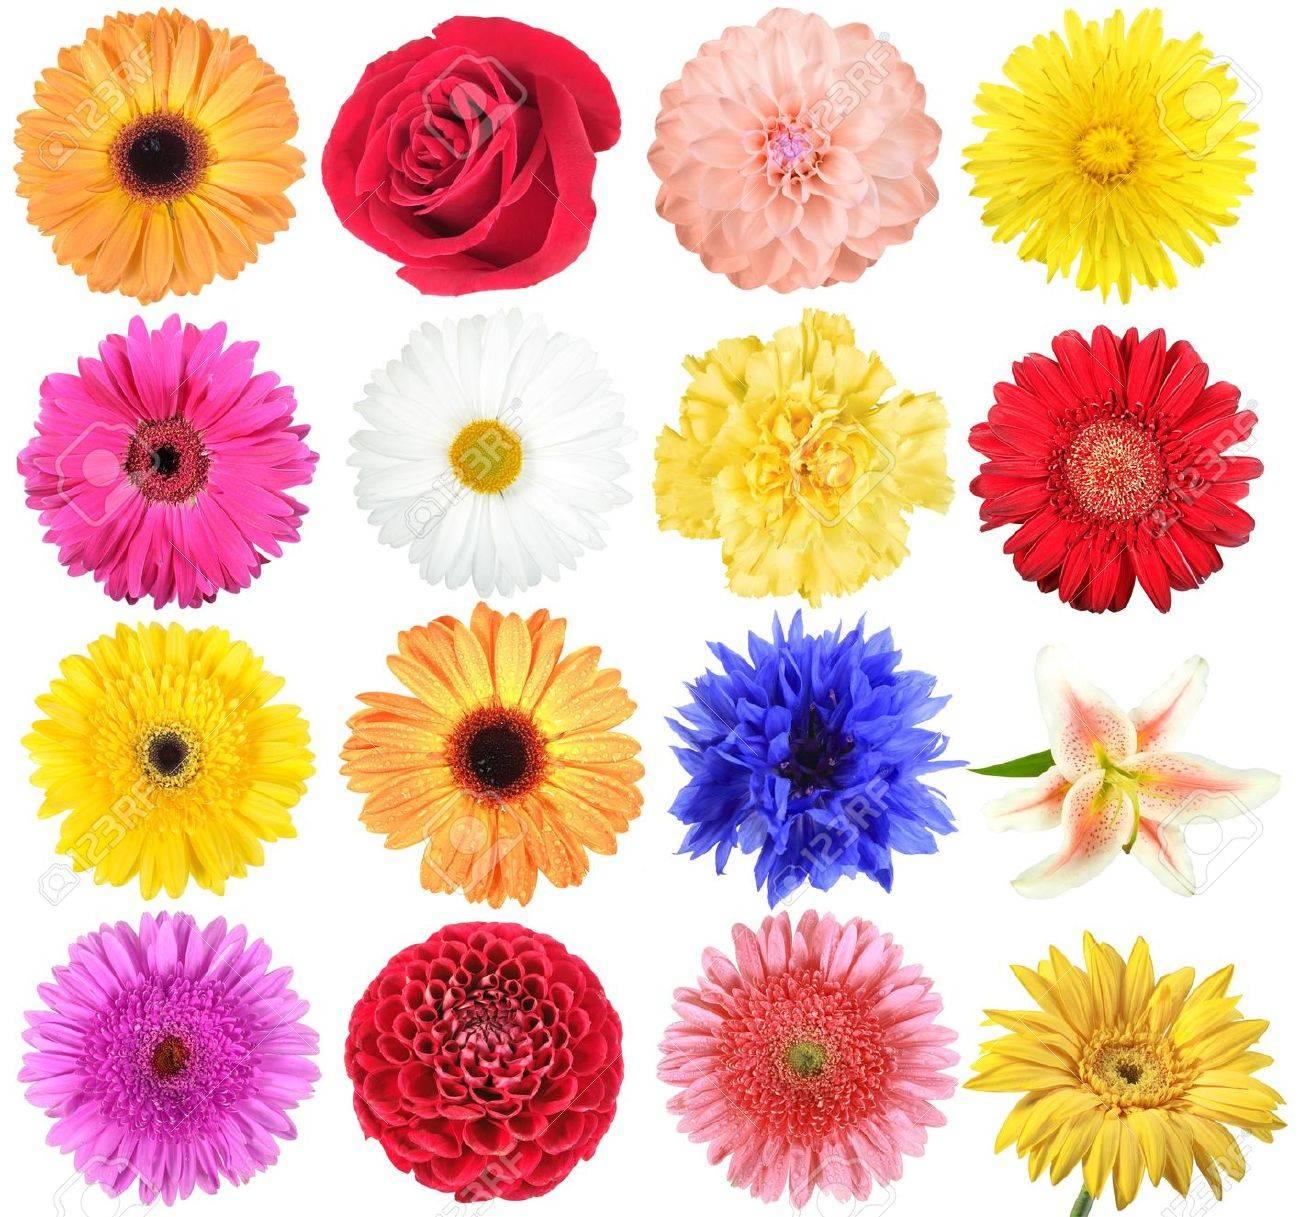 Set of flowers. Isolated on white background. Close-up. Stock Photo - 7763840